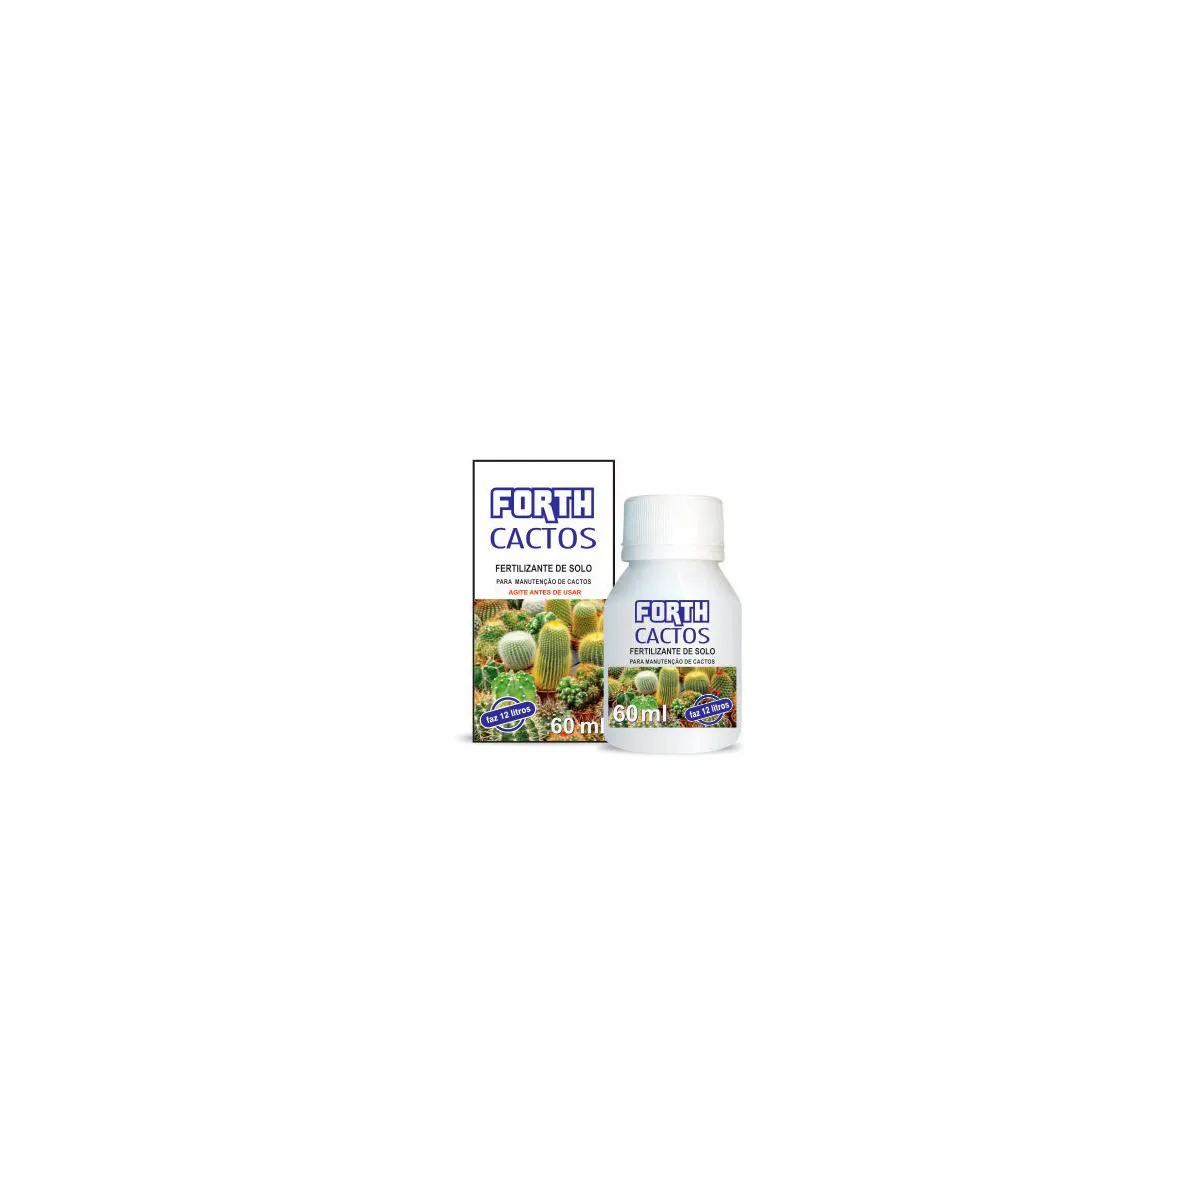 Fertilizante Forth Cactos 60ml  - Vasos Raiz Loja Oficial